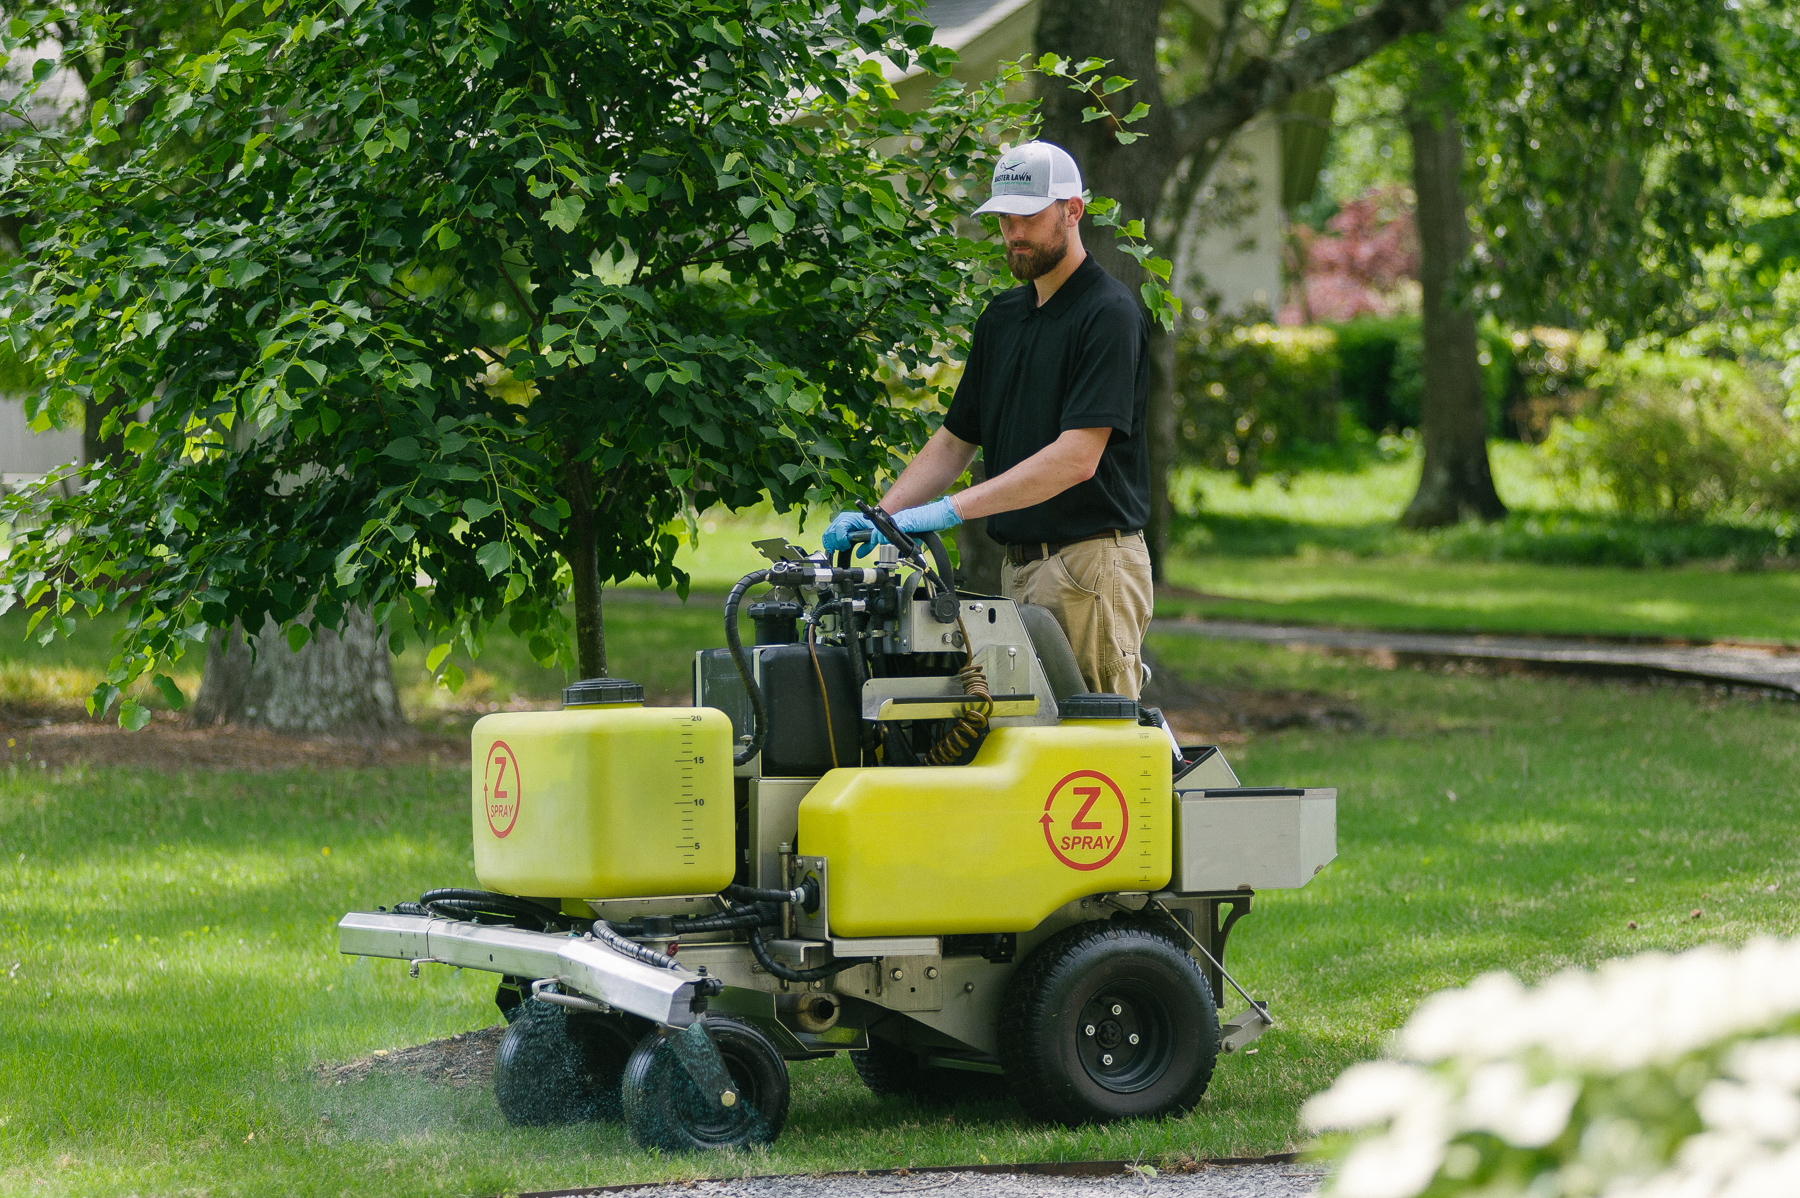 lawn technician spraying weed control